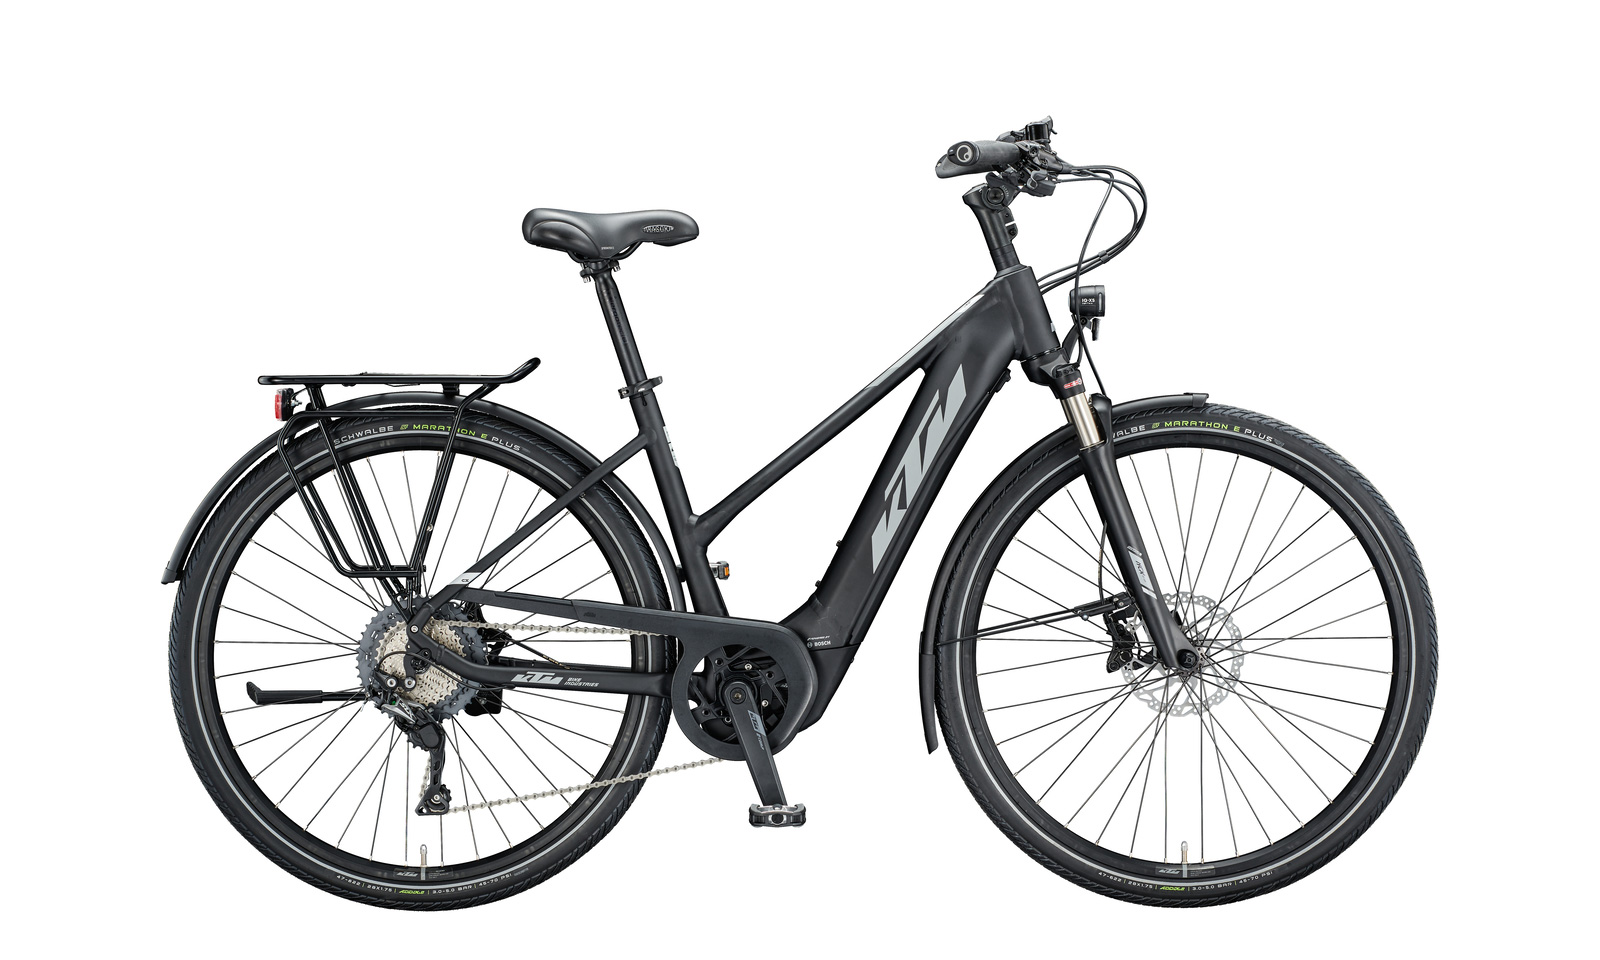 Biciclete electrice KTM E-Onroad MACINA STYLE XL 1x11 Shimano SLX